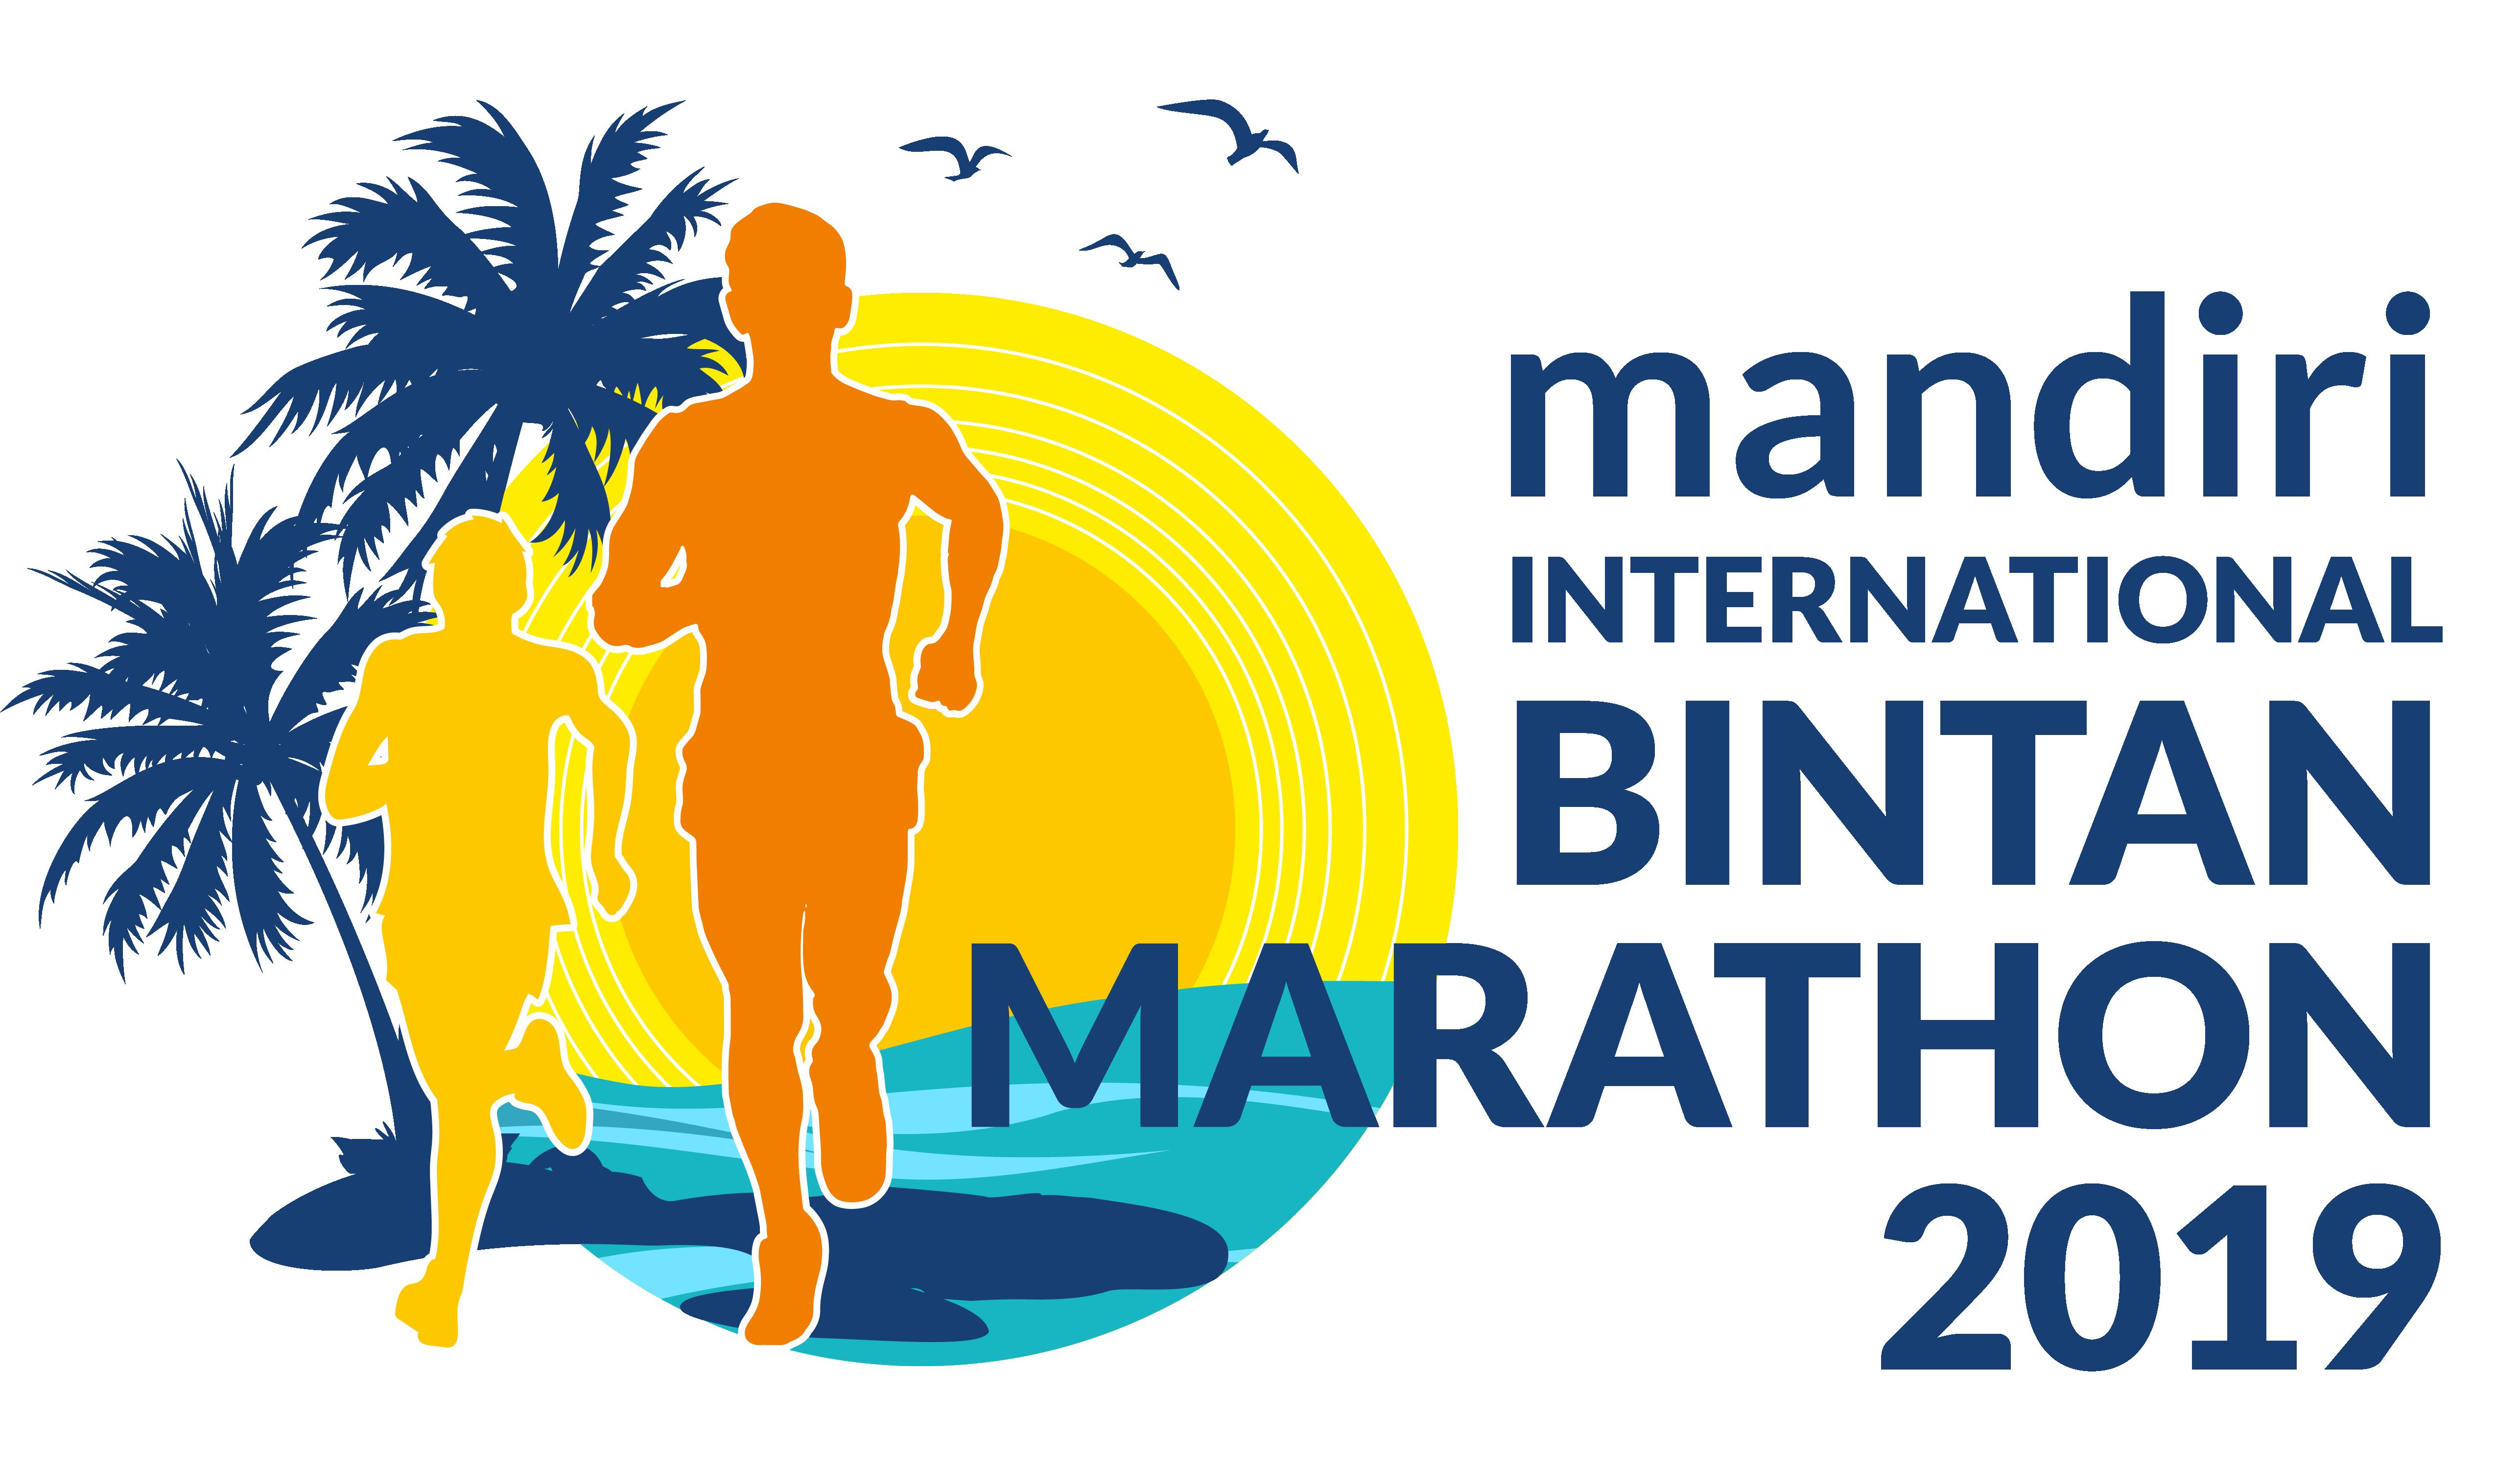 Mandiri International Bintan Marathon 2019